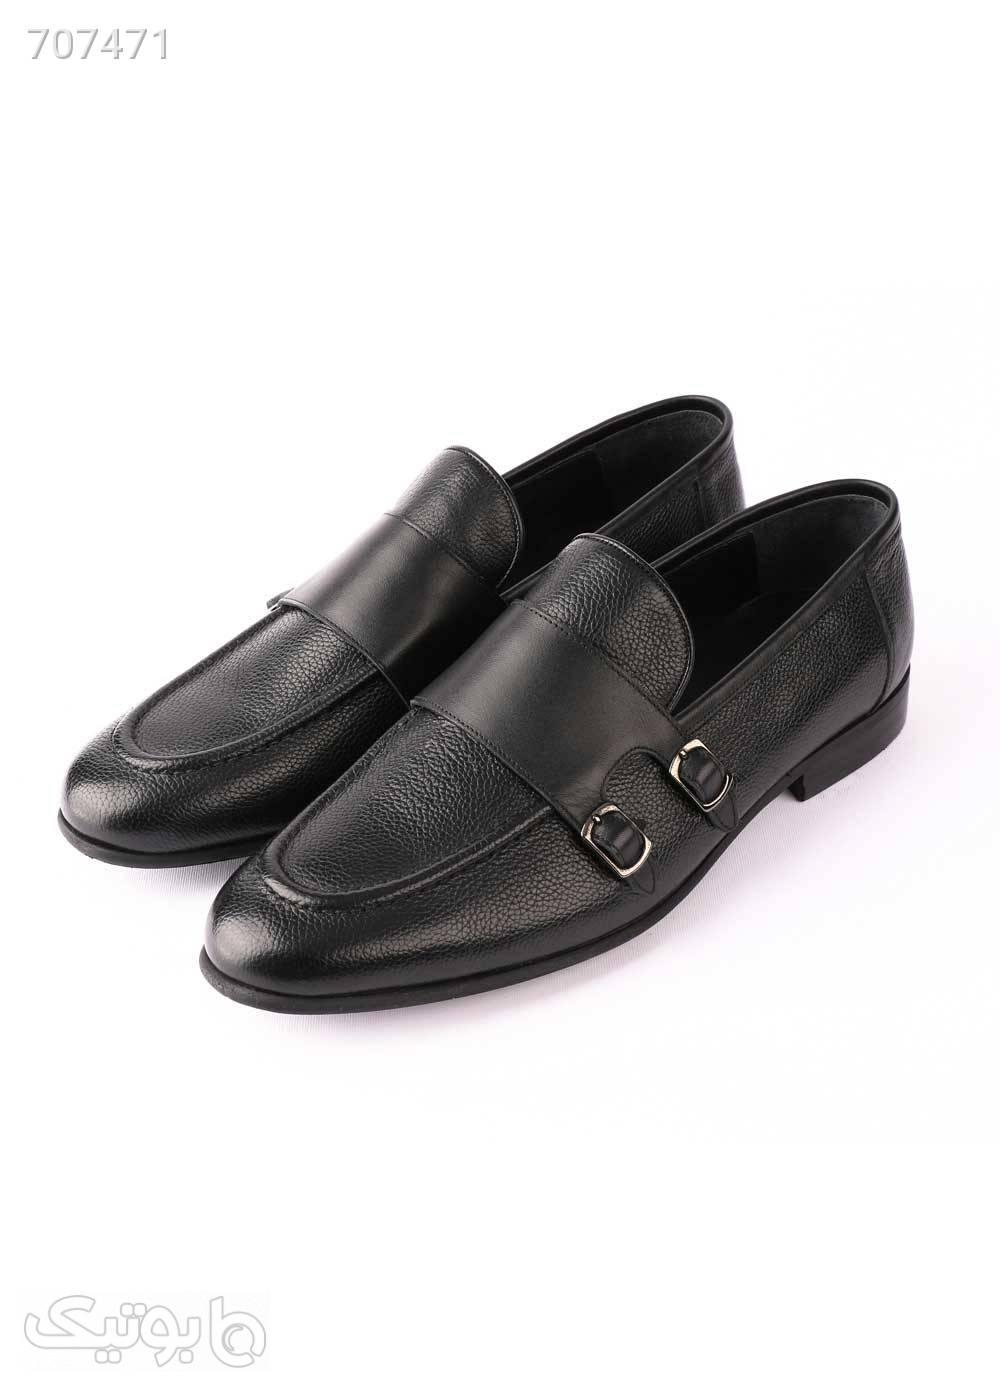 کفش کلاسیک مردانه مرسدس قهوه ای كفش مردانه